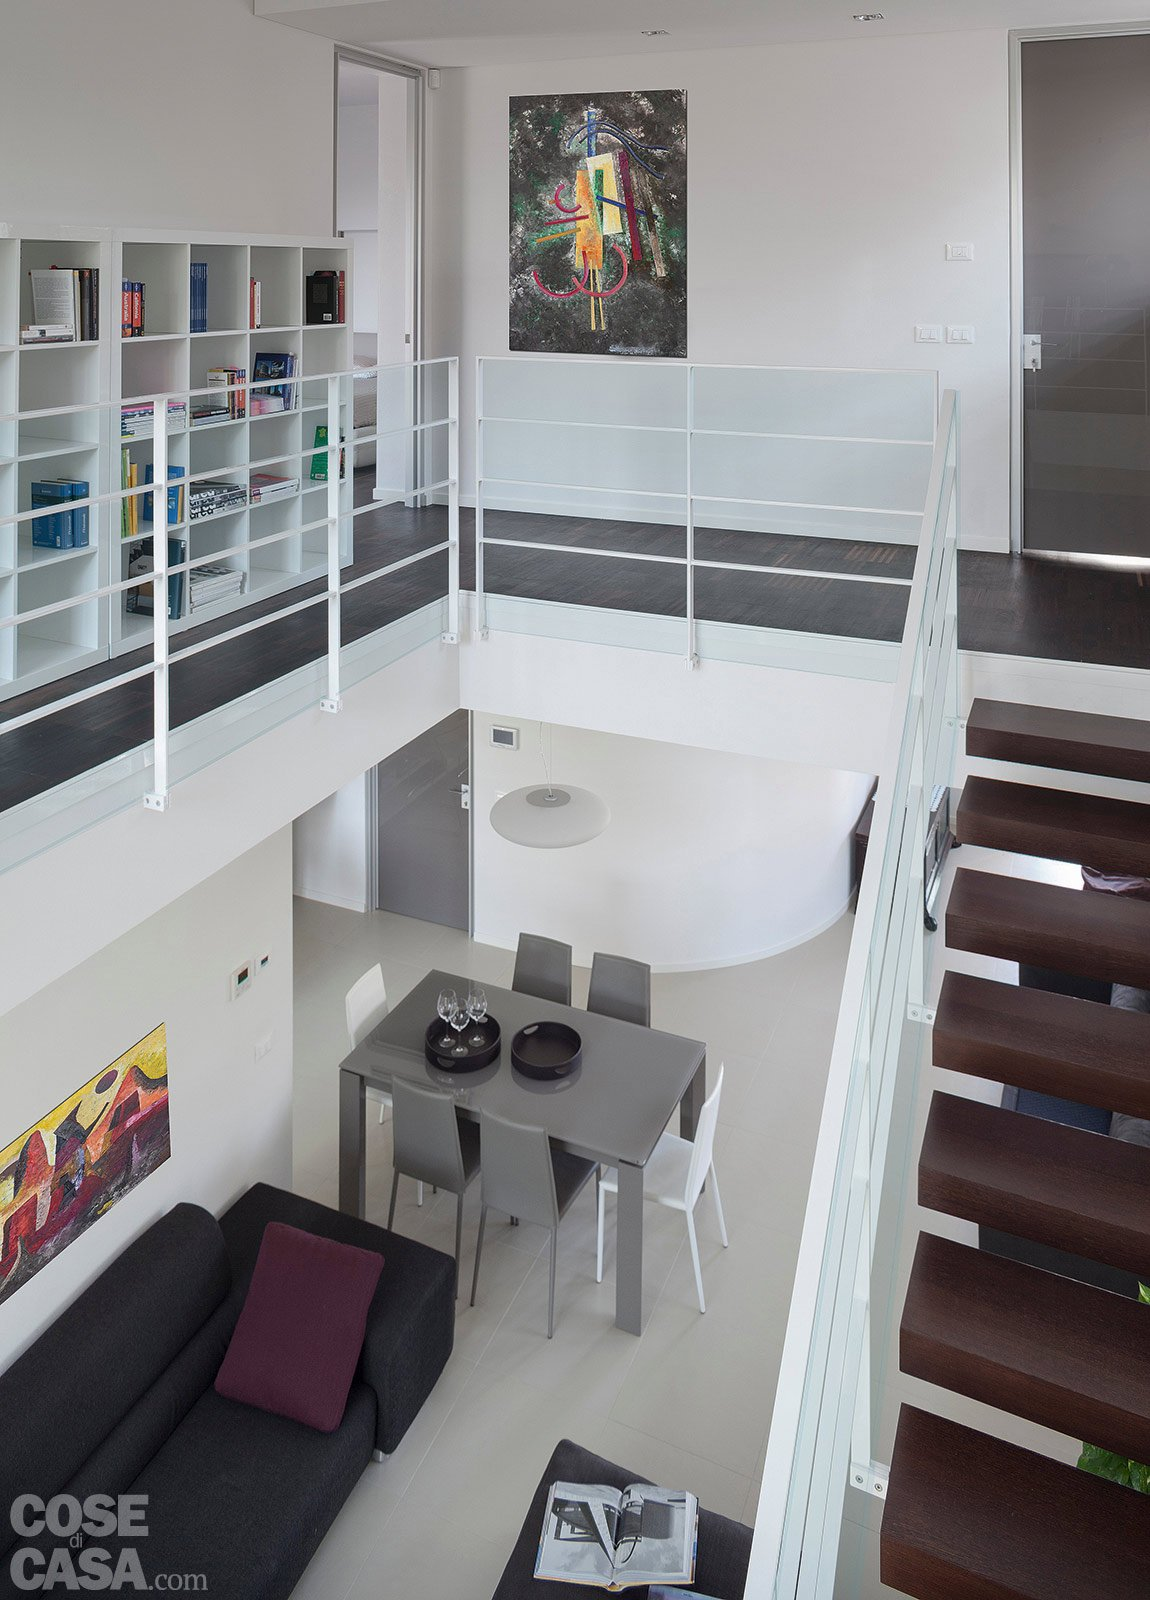 Architetture in piena luce cose di casa for 5000 piani moderni di case